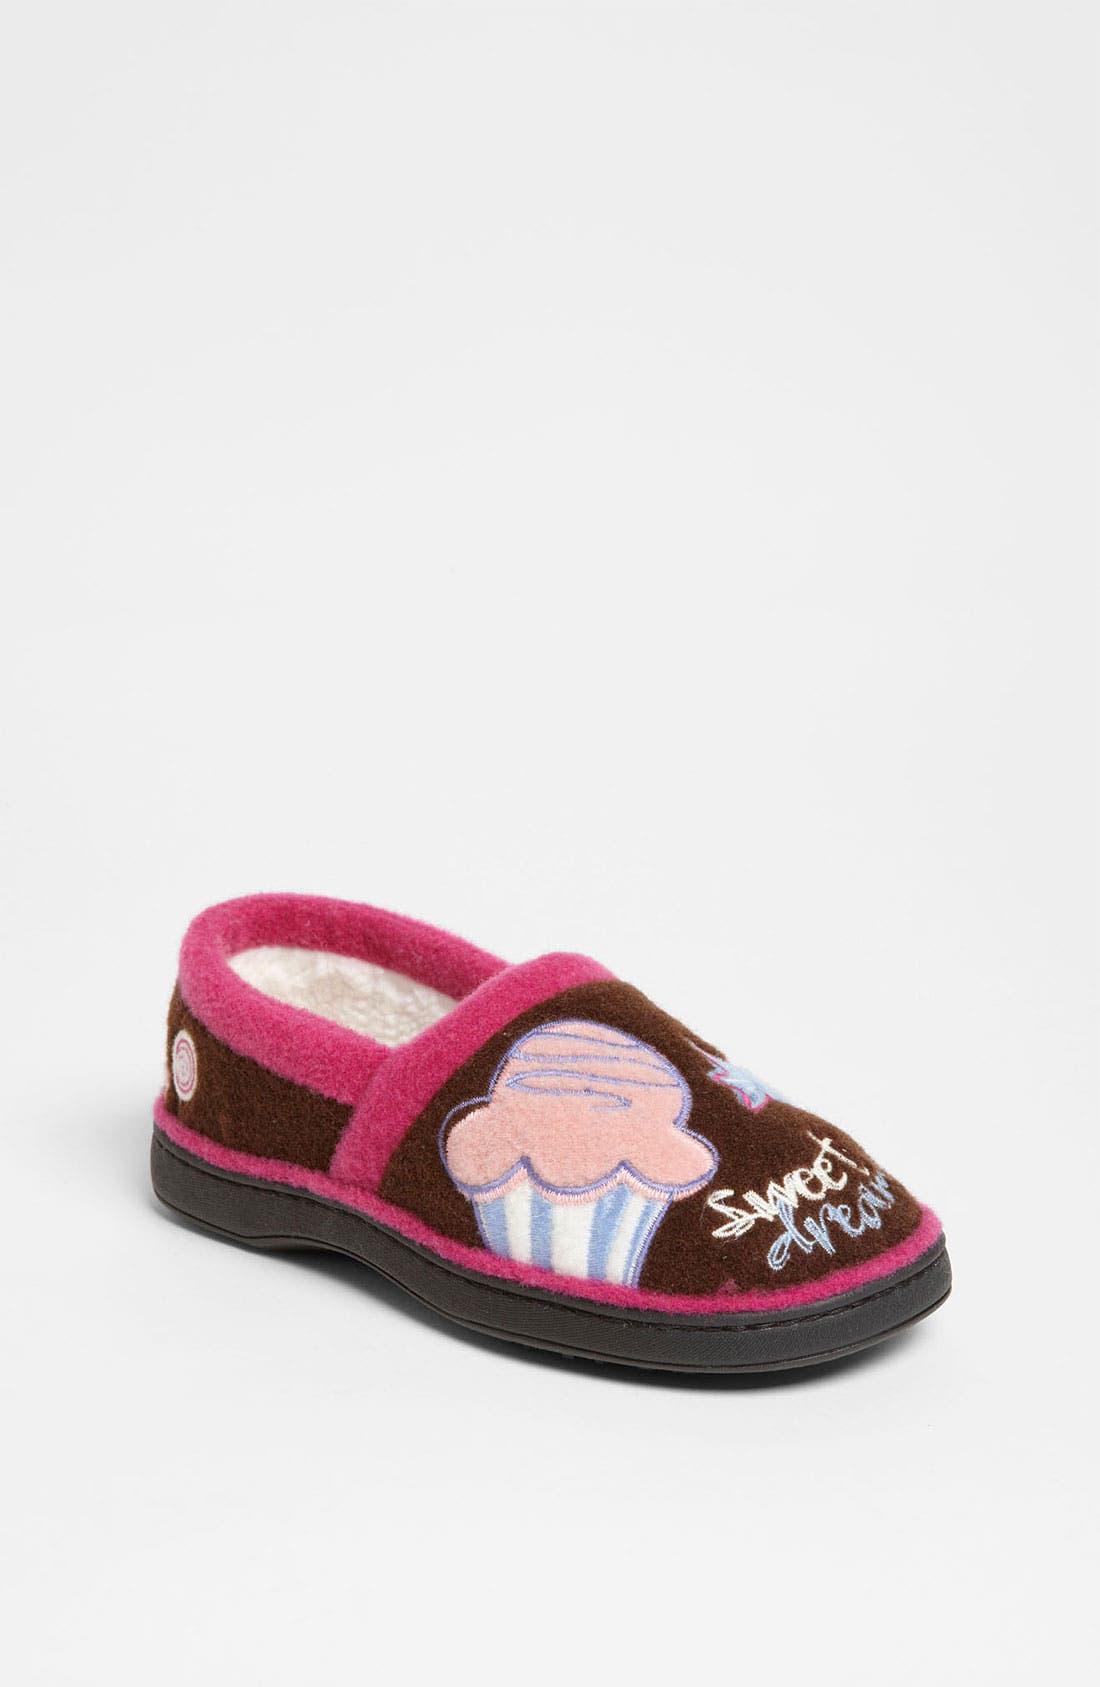 Main Image - Acorn 'Sweet Dreams' Slipper (Toddler, Little Kid & Big Kid)